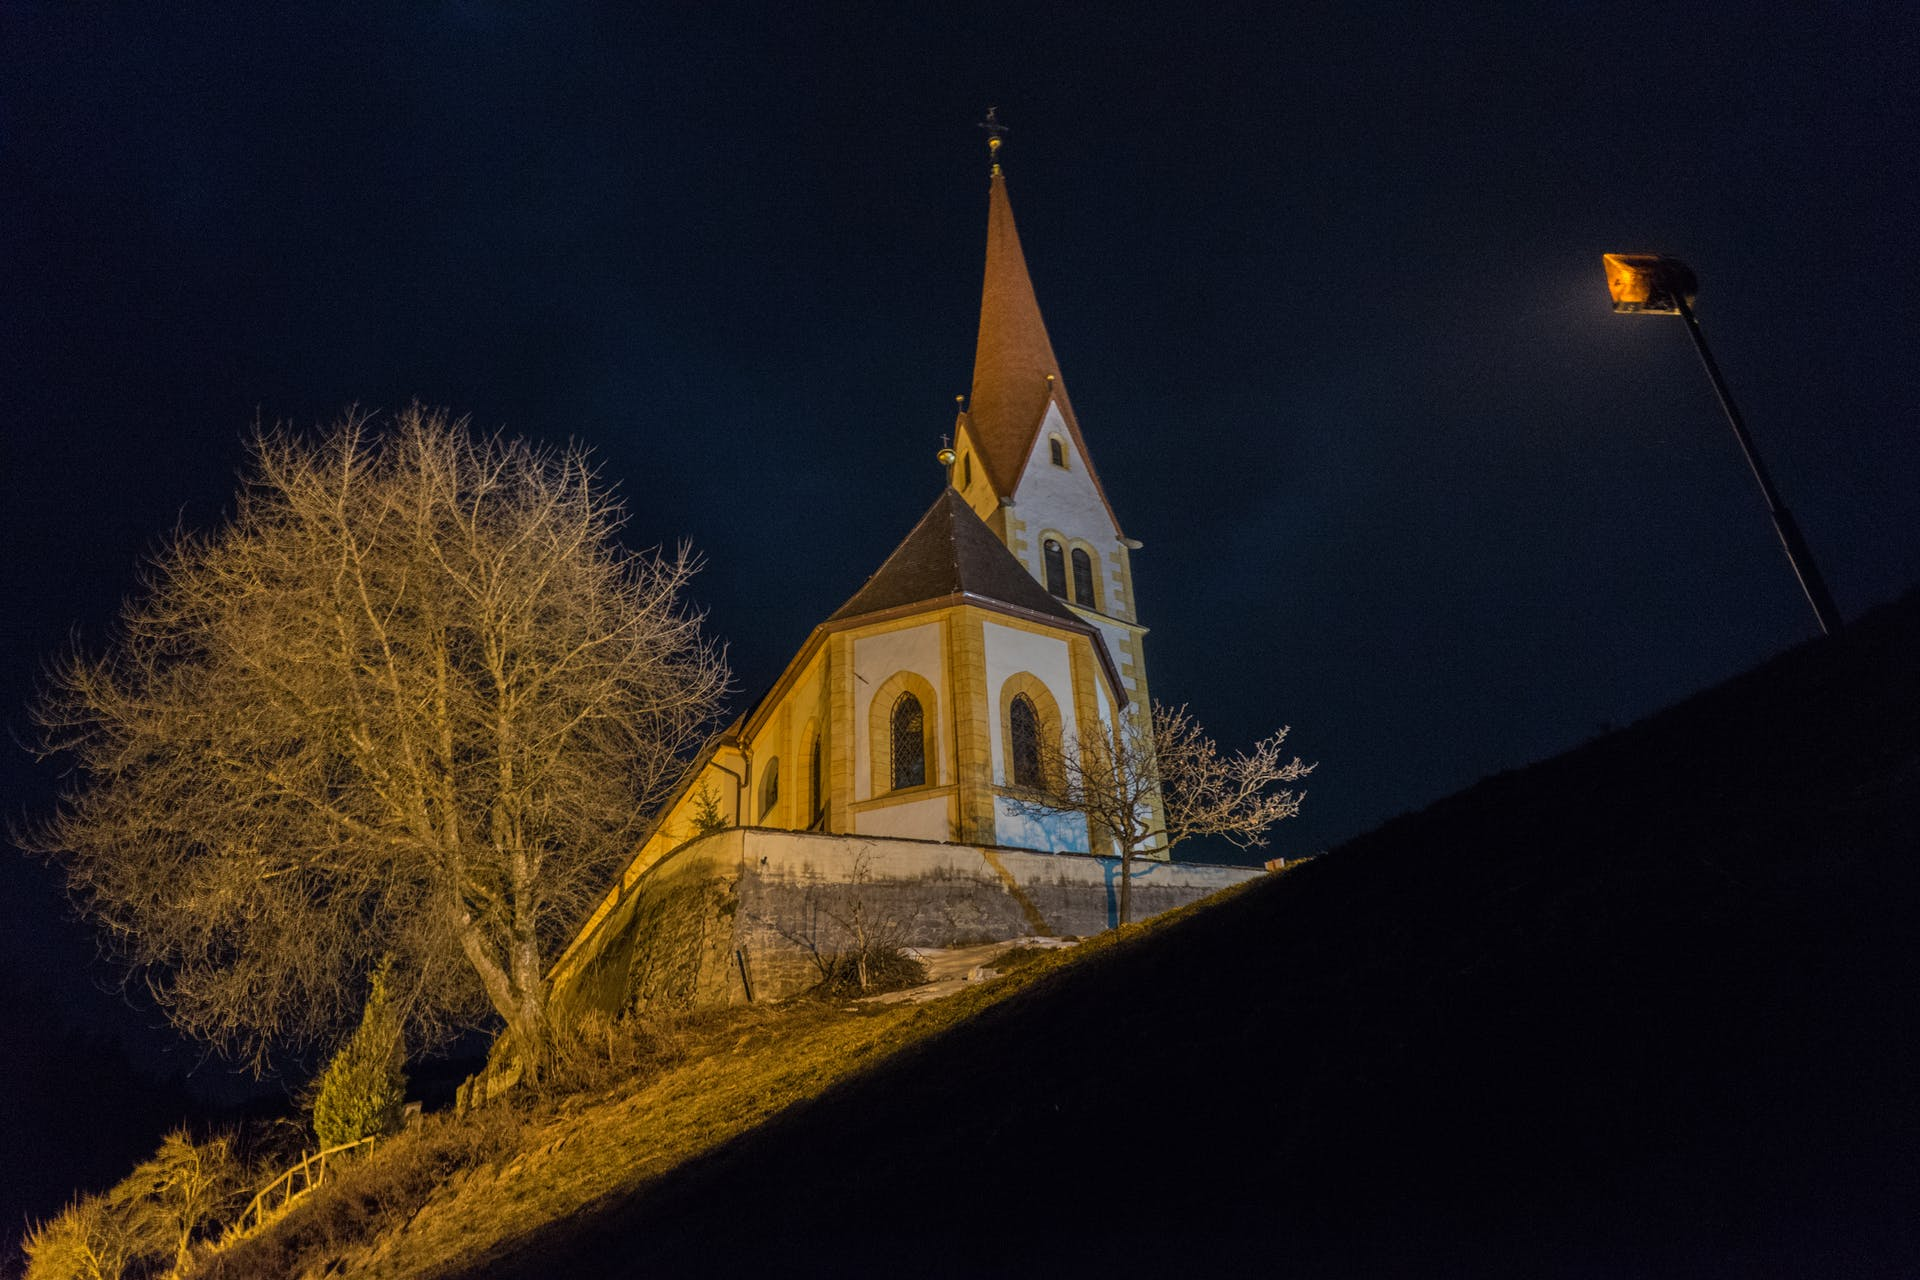 night austria architecture church